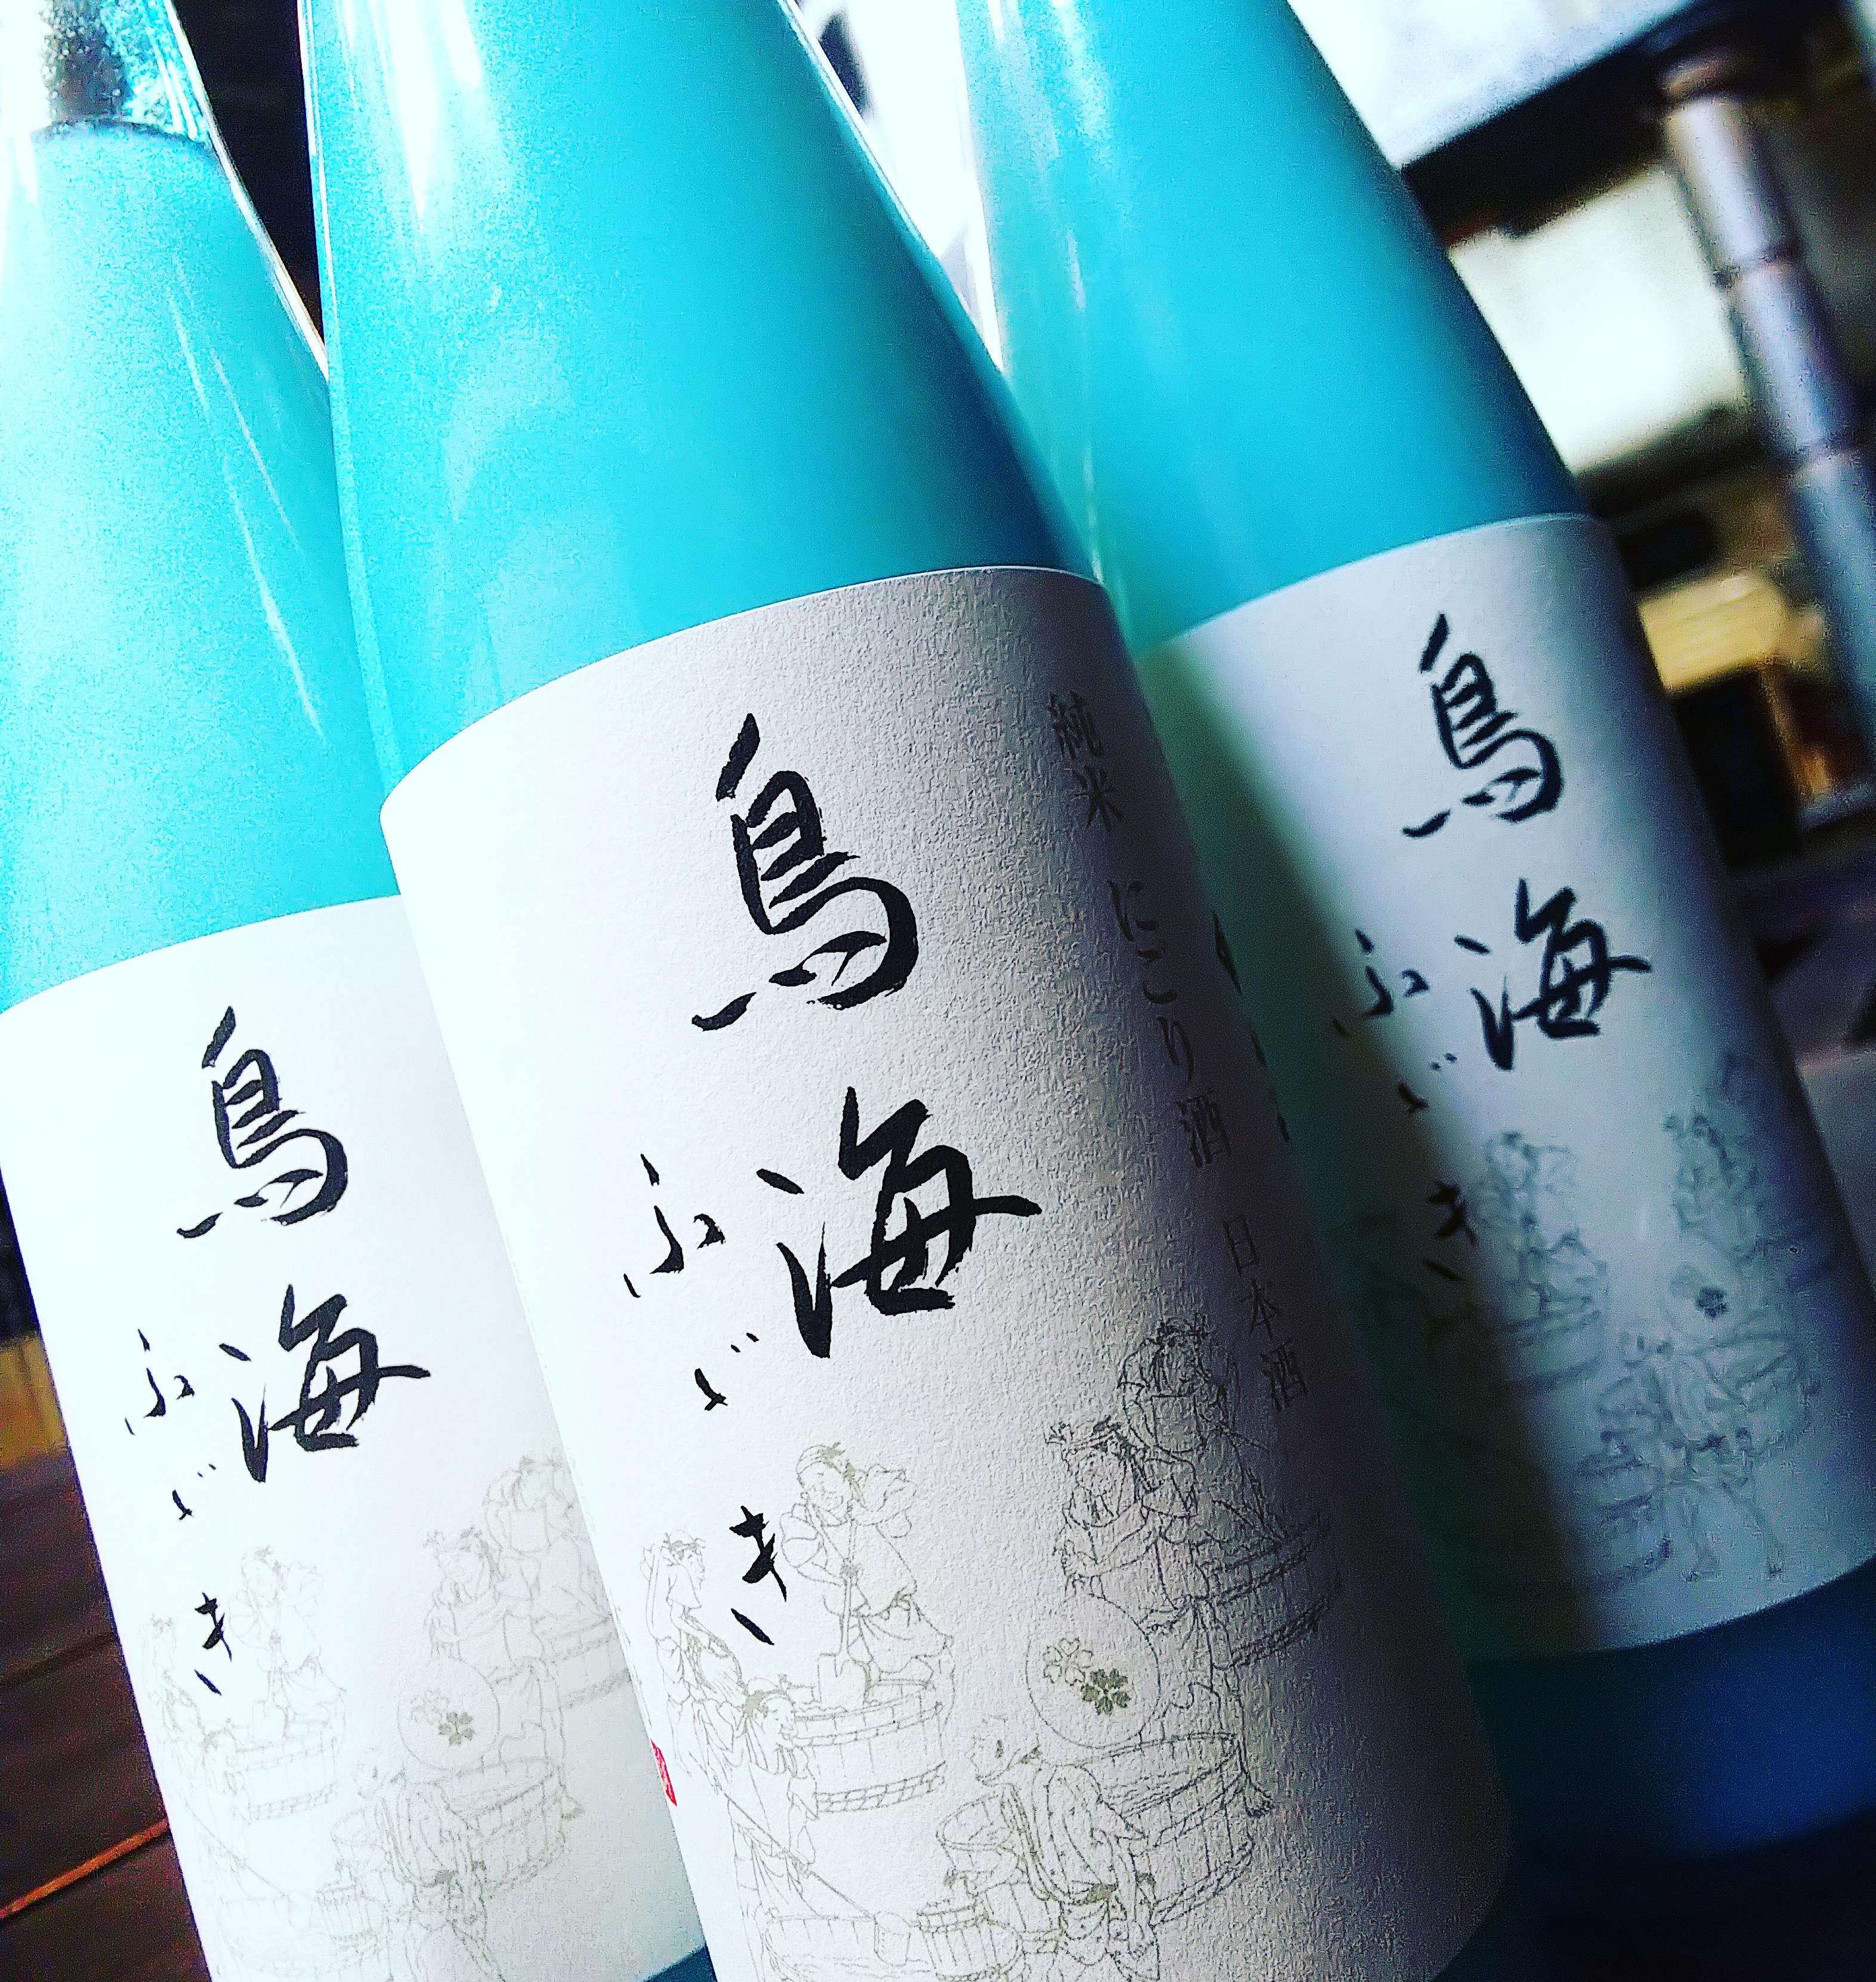 http://www.fukukomachi.com/blog/photo/IMG_20191213_161022_939.jpg